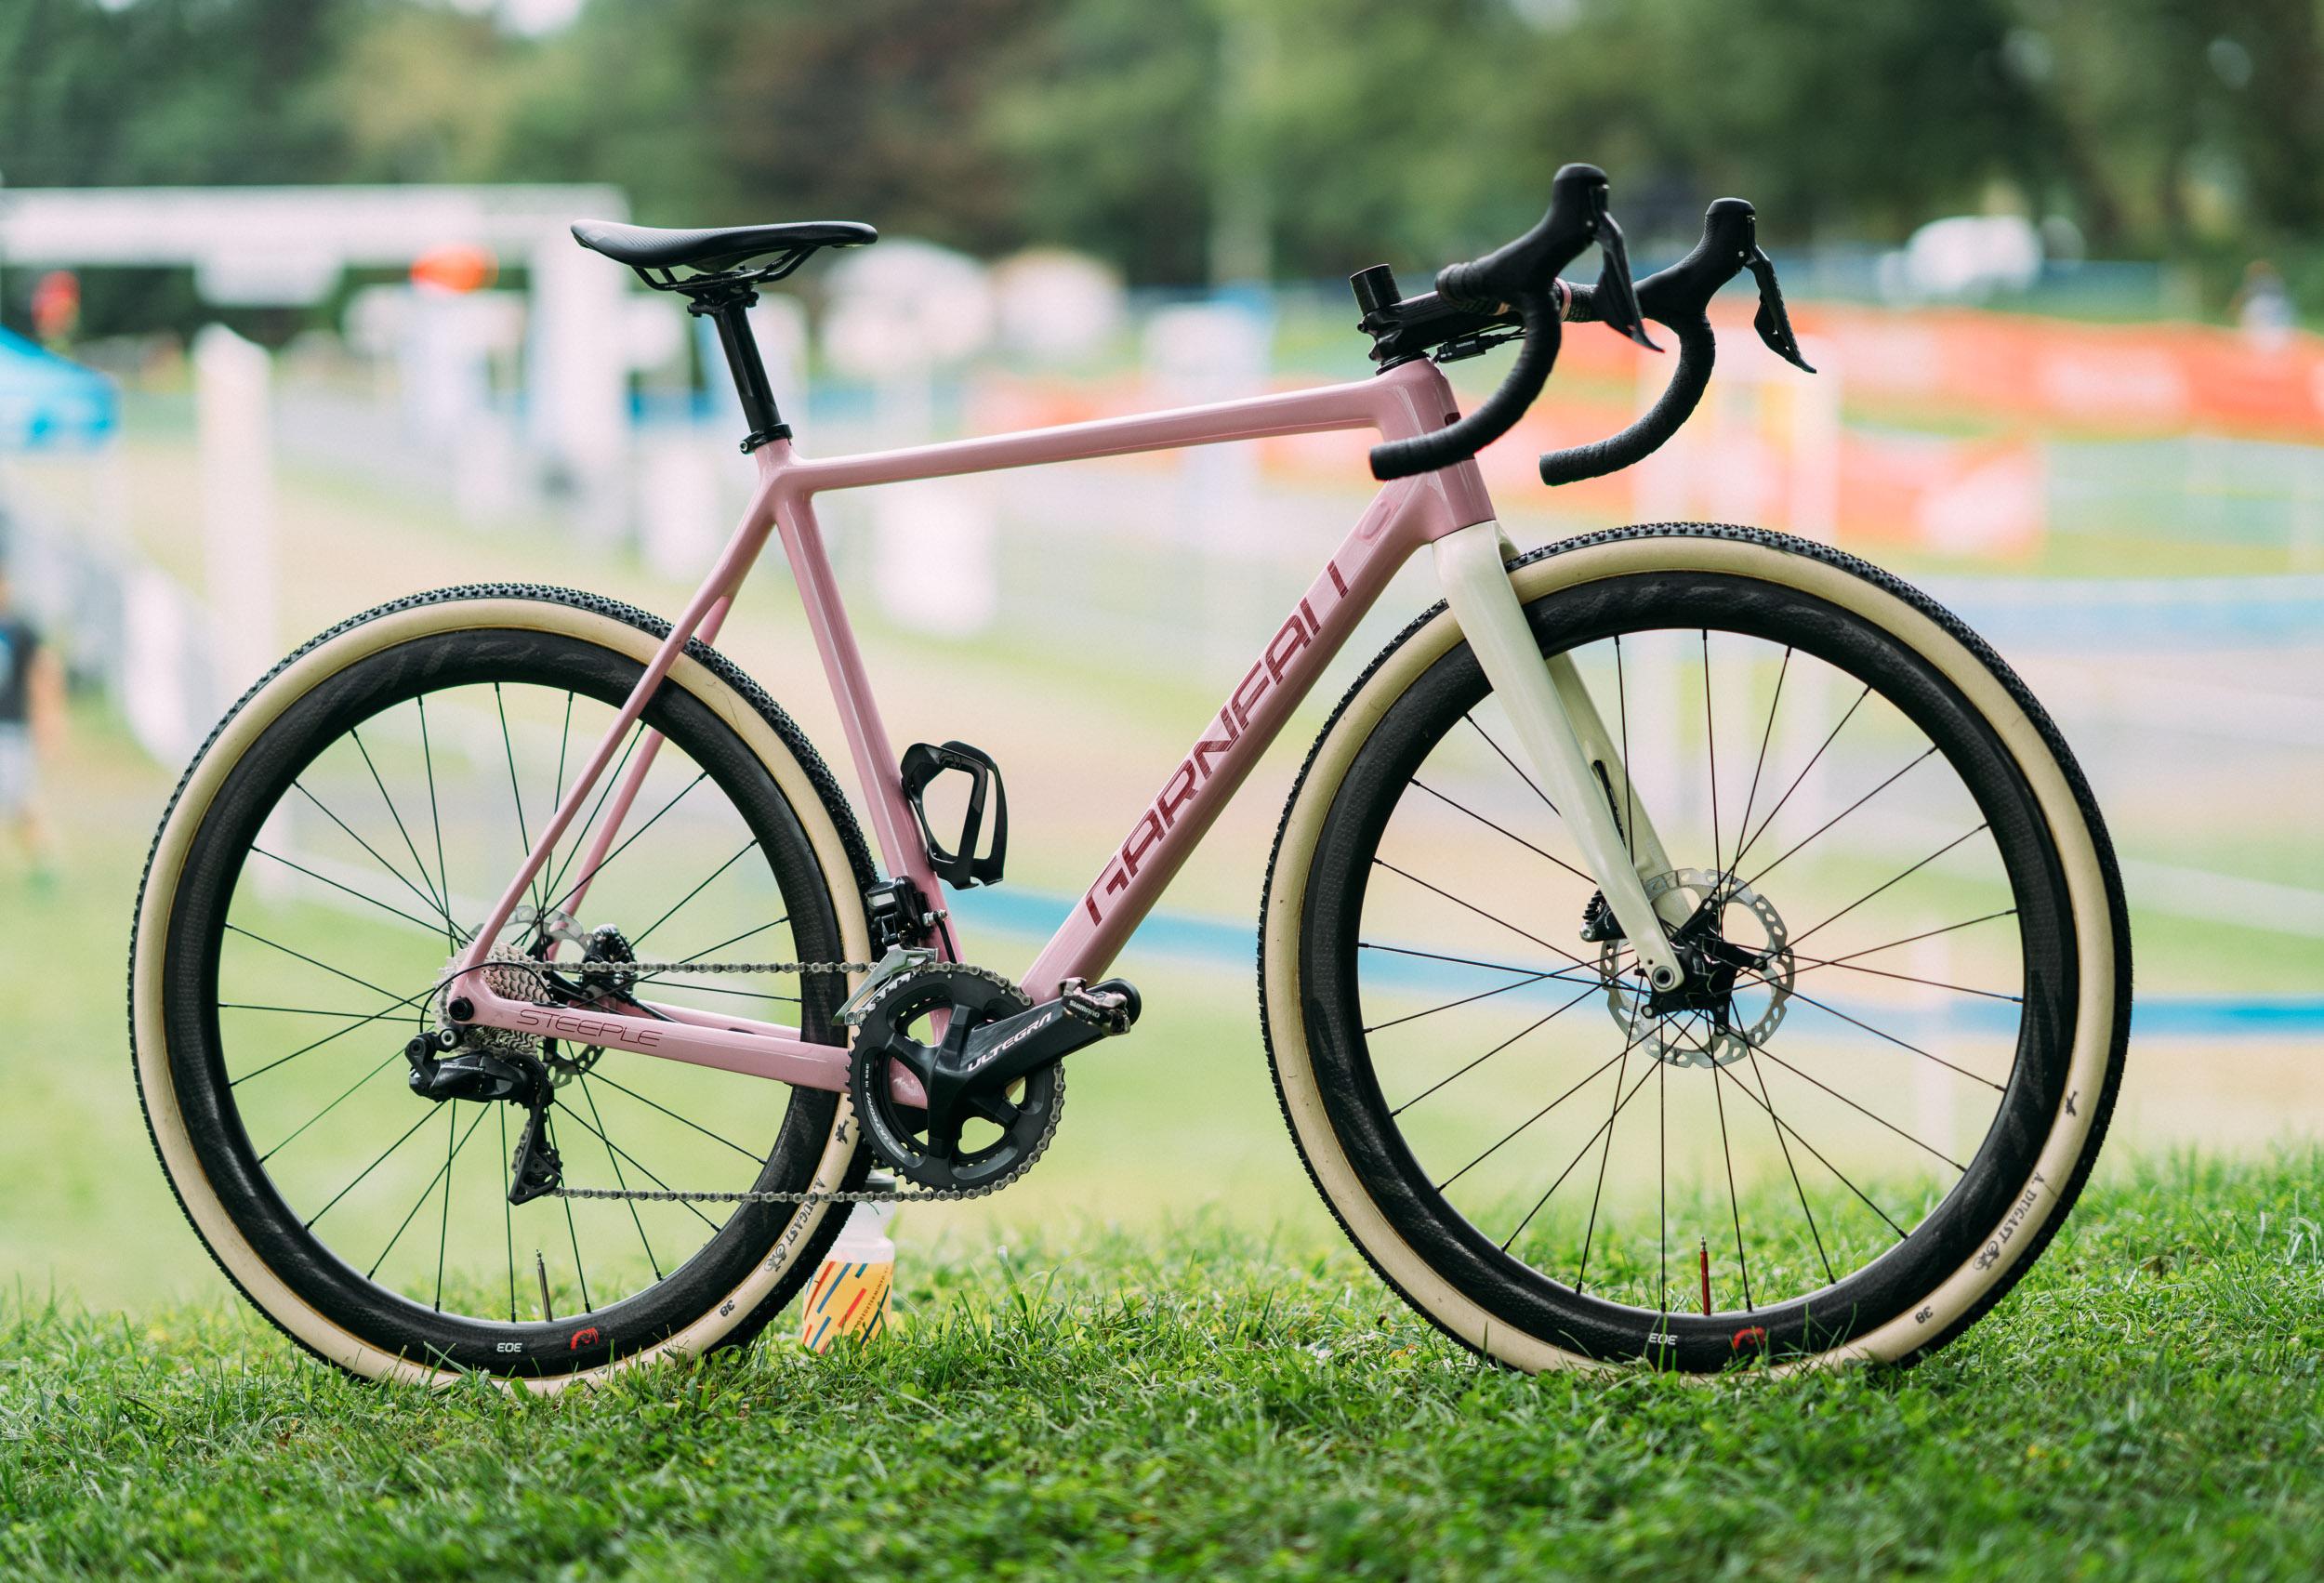 photo-rhetoric-to-be-determined-pink-garneau-steeple-cyclocross-bike-2010.jpg